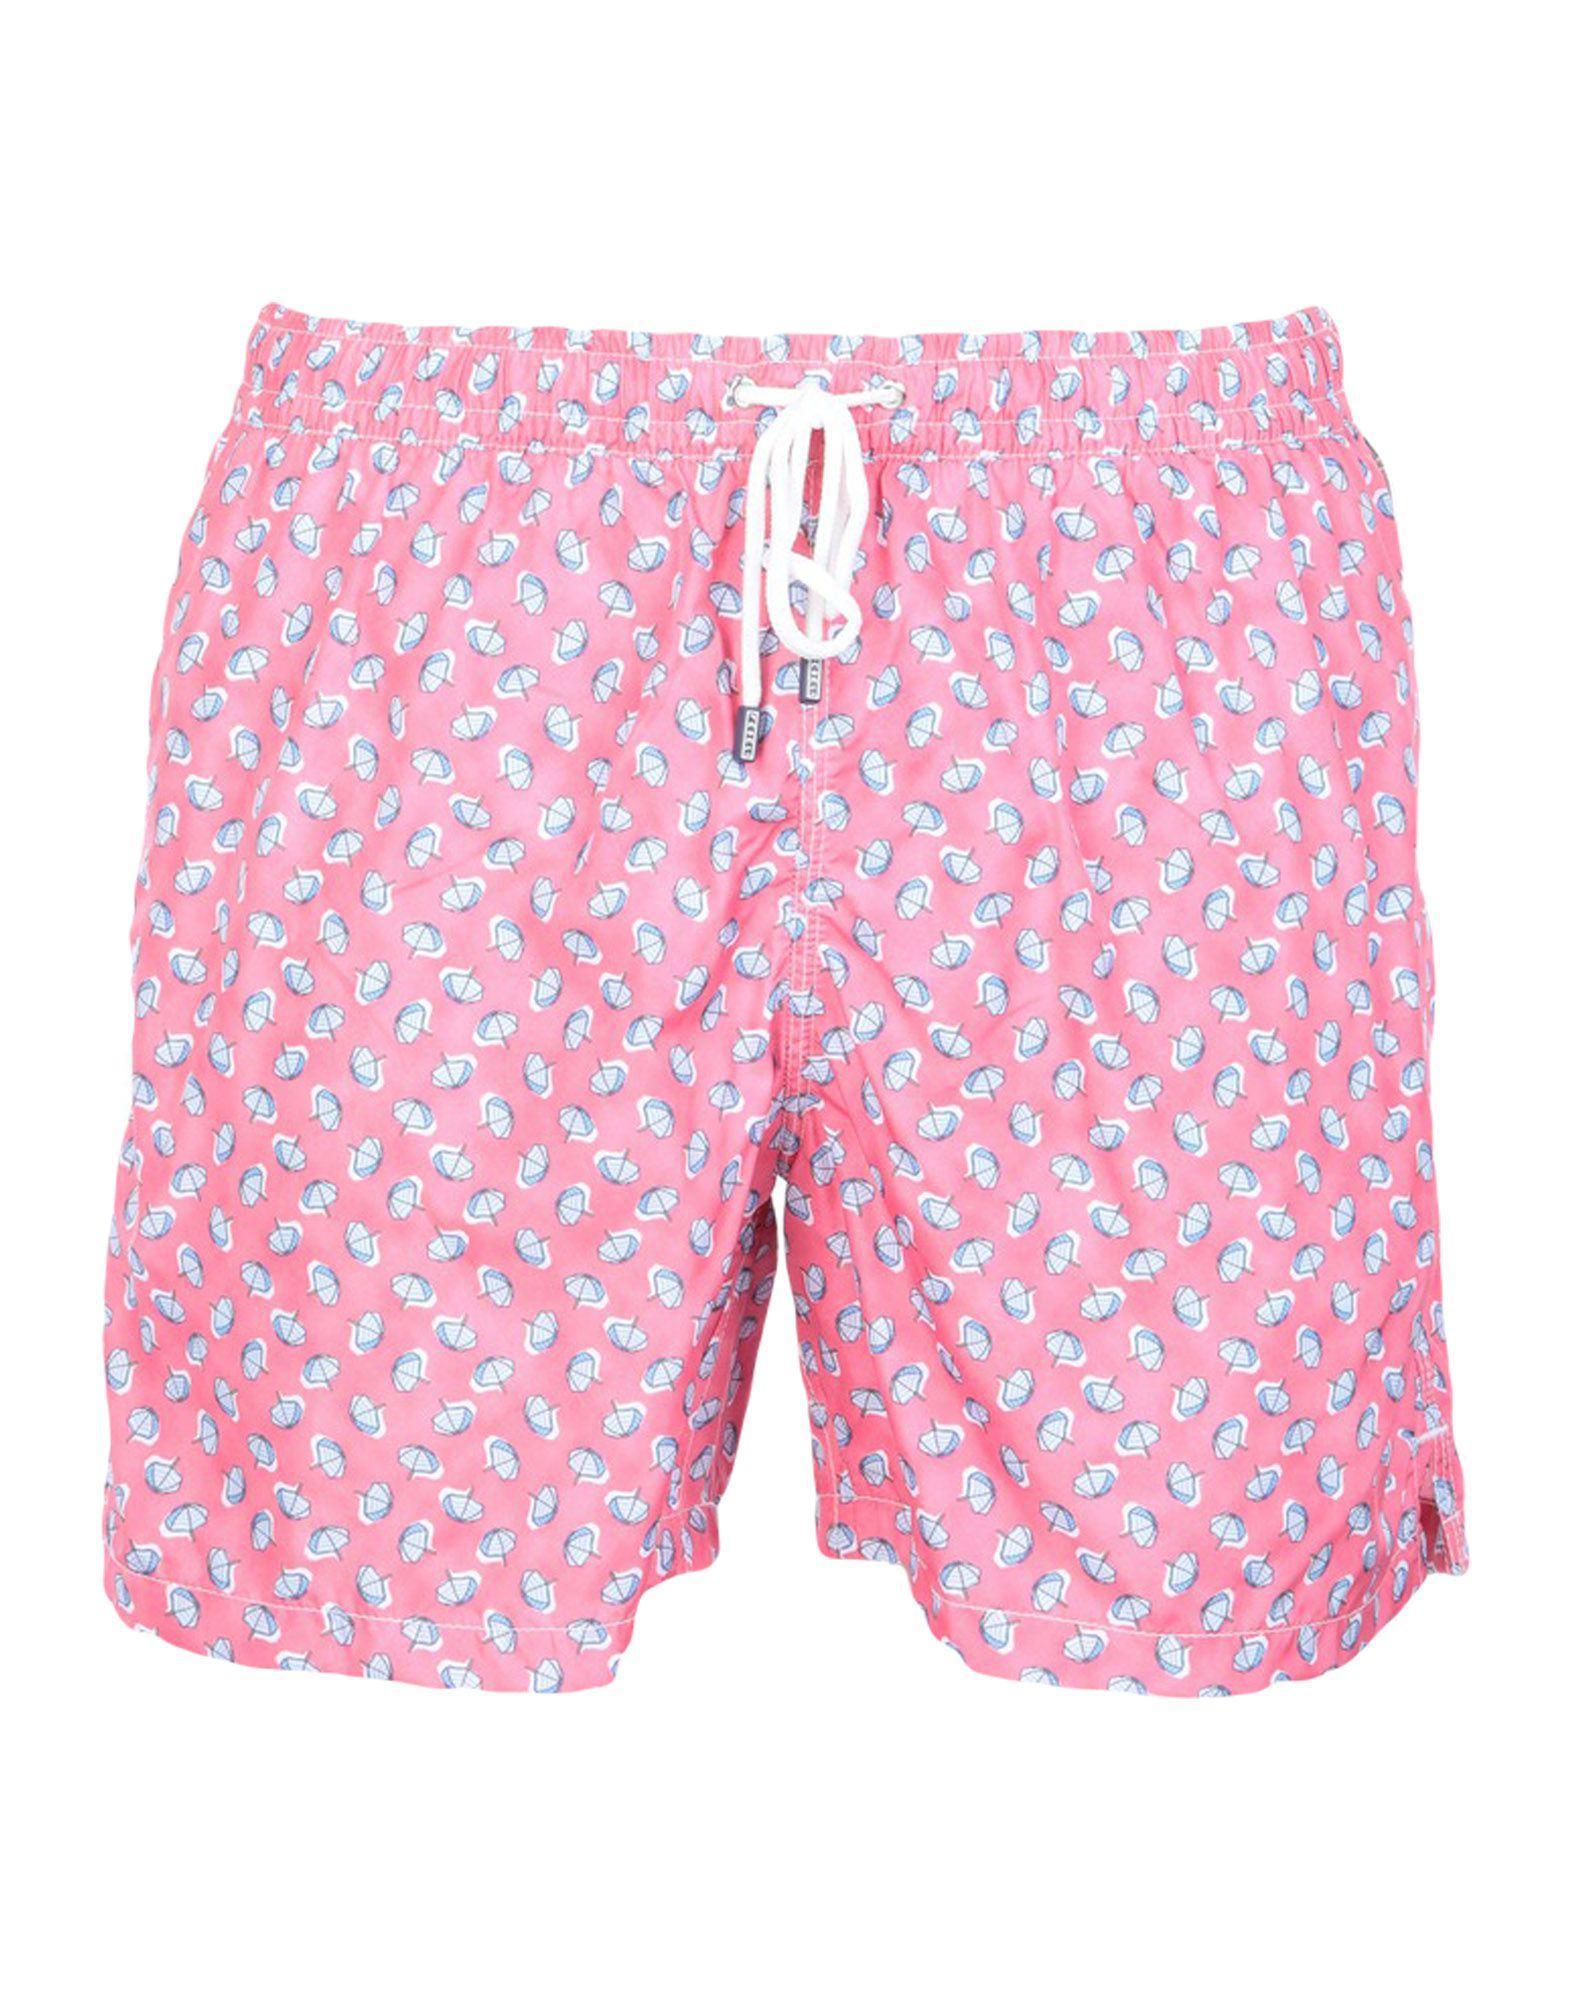 4ea83d5654 Lyst - Fedeli Swimming Trunks in Pink for Men